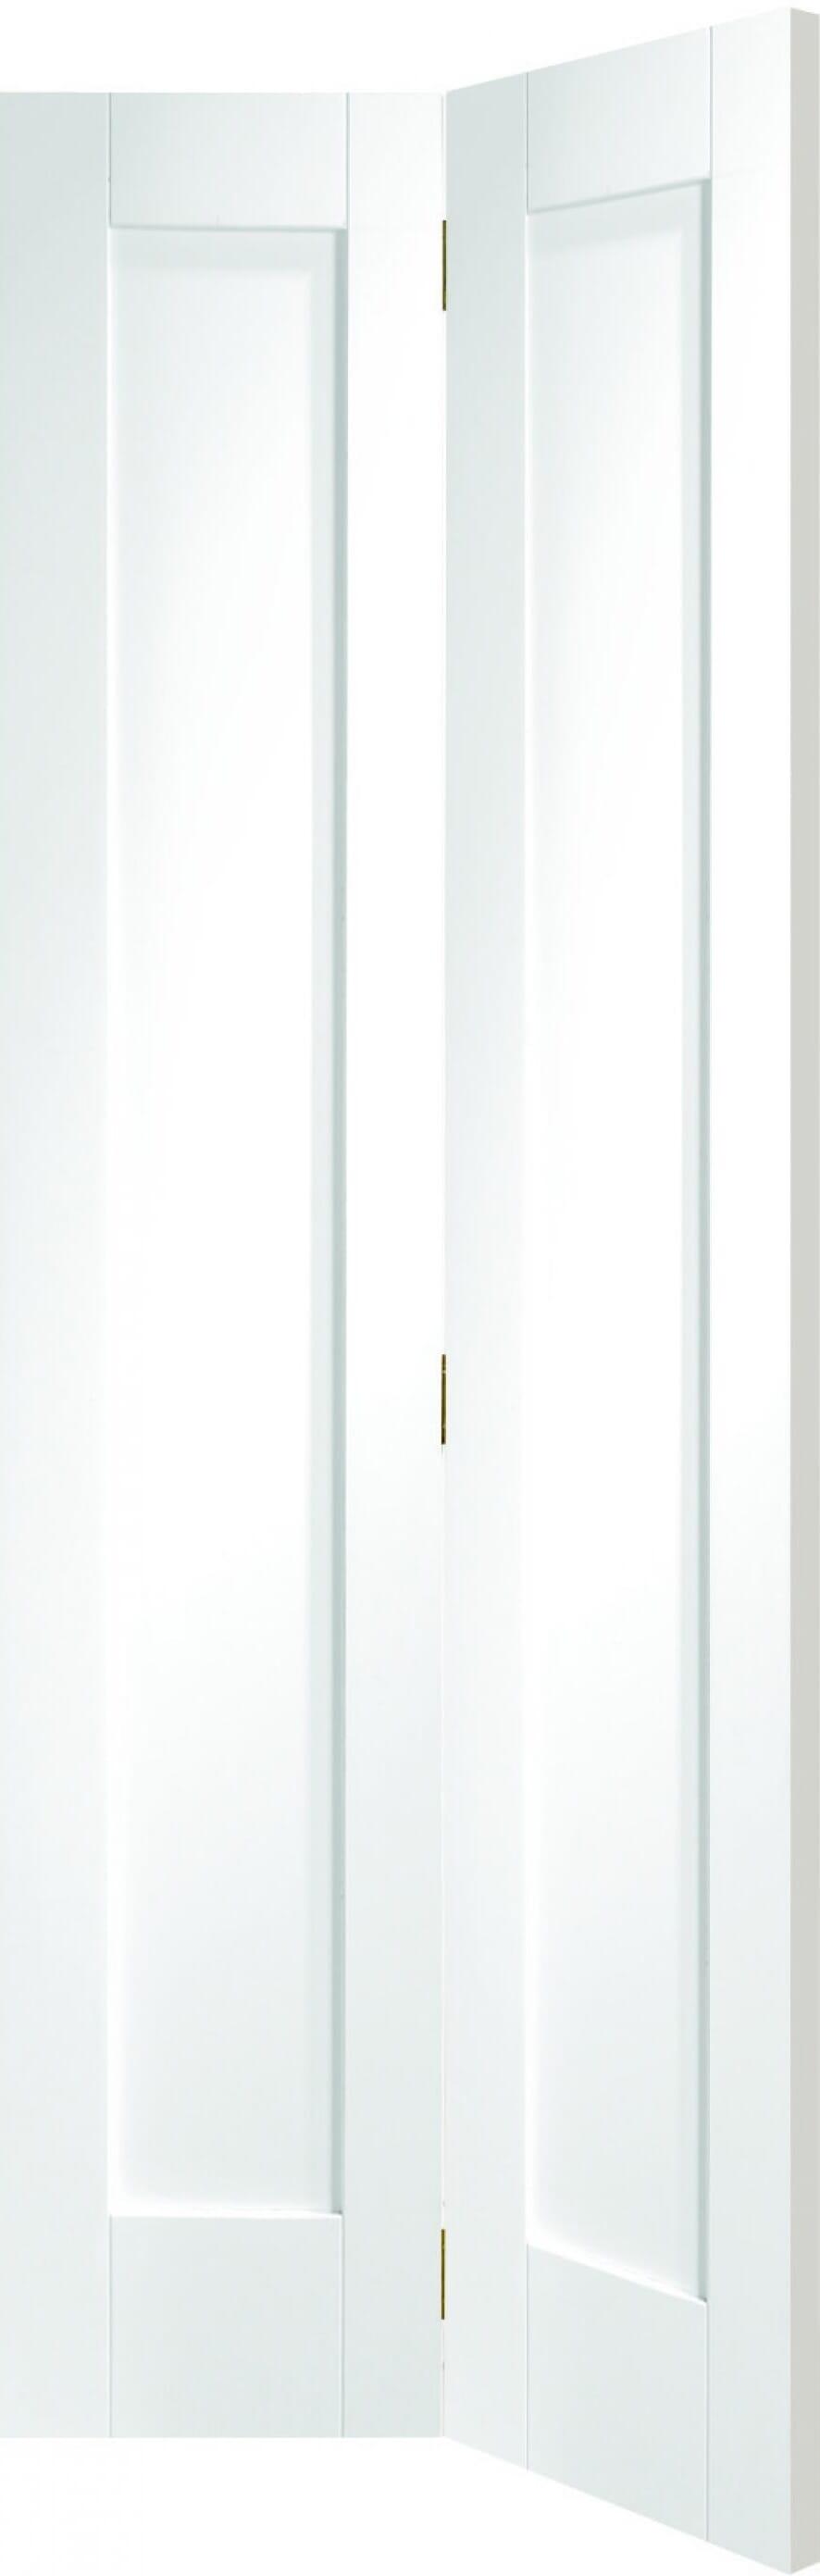 Pattern 10 White Bi-fold Image